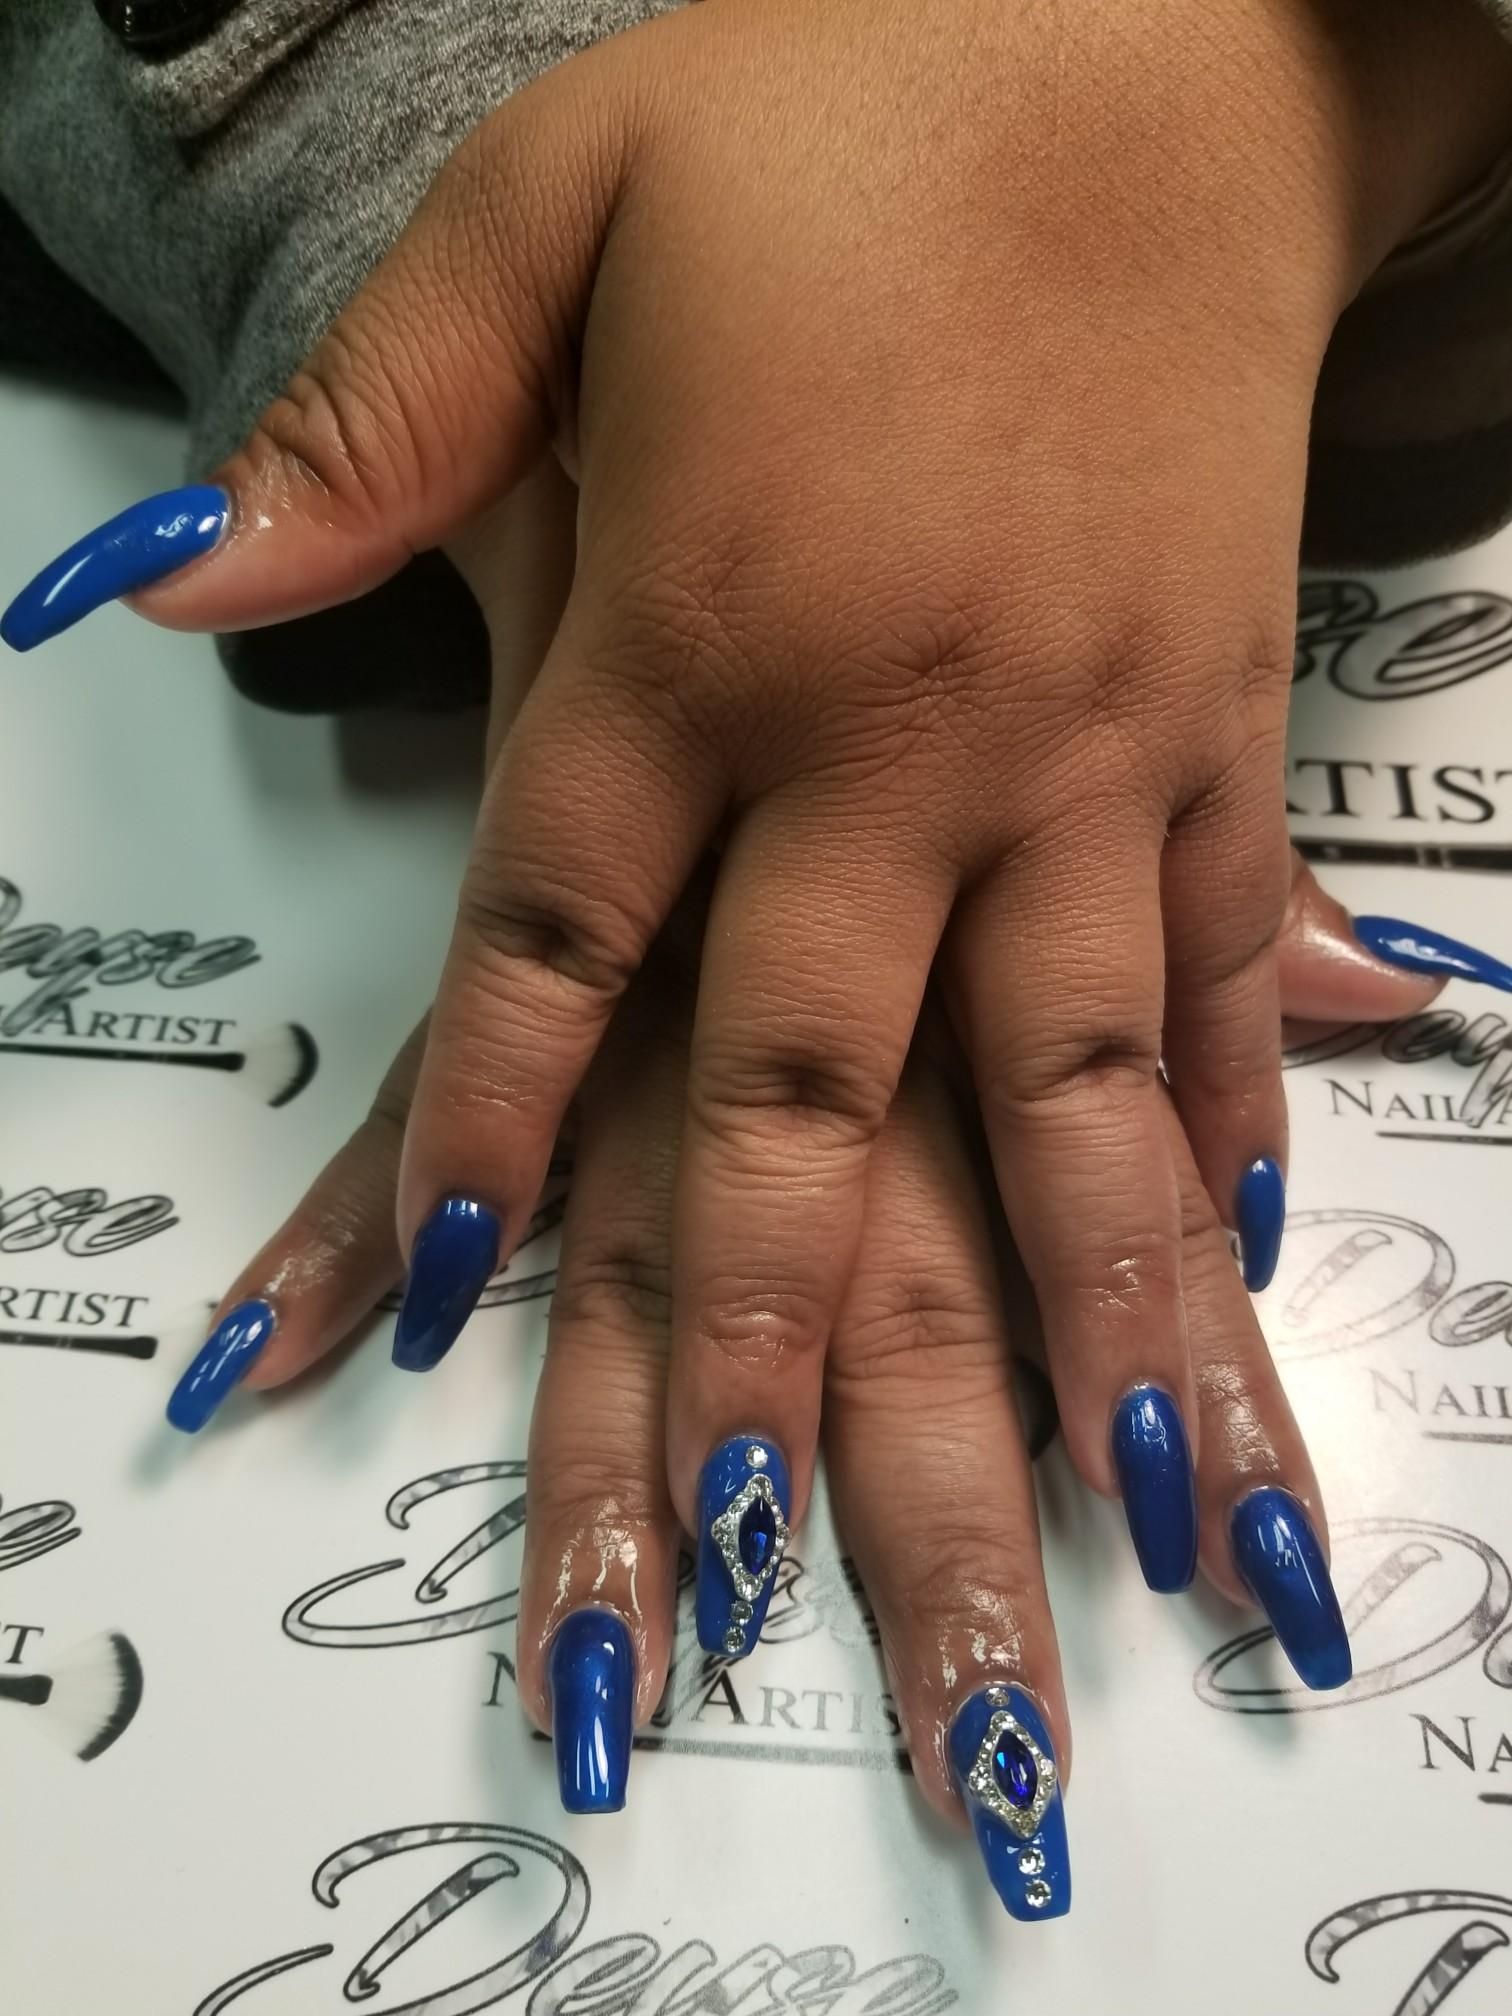 Nails By Deyse 1547 N Farwell Ave, Milwaukee, WI 53202 - YP.com